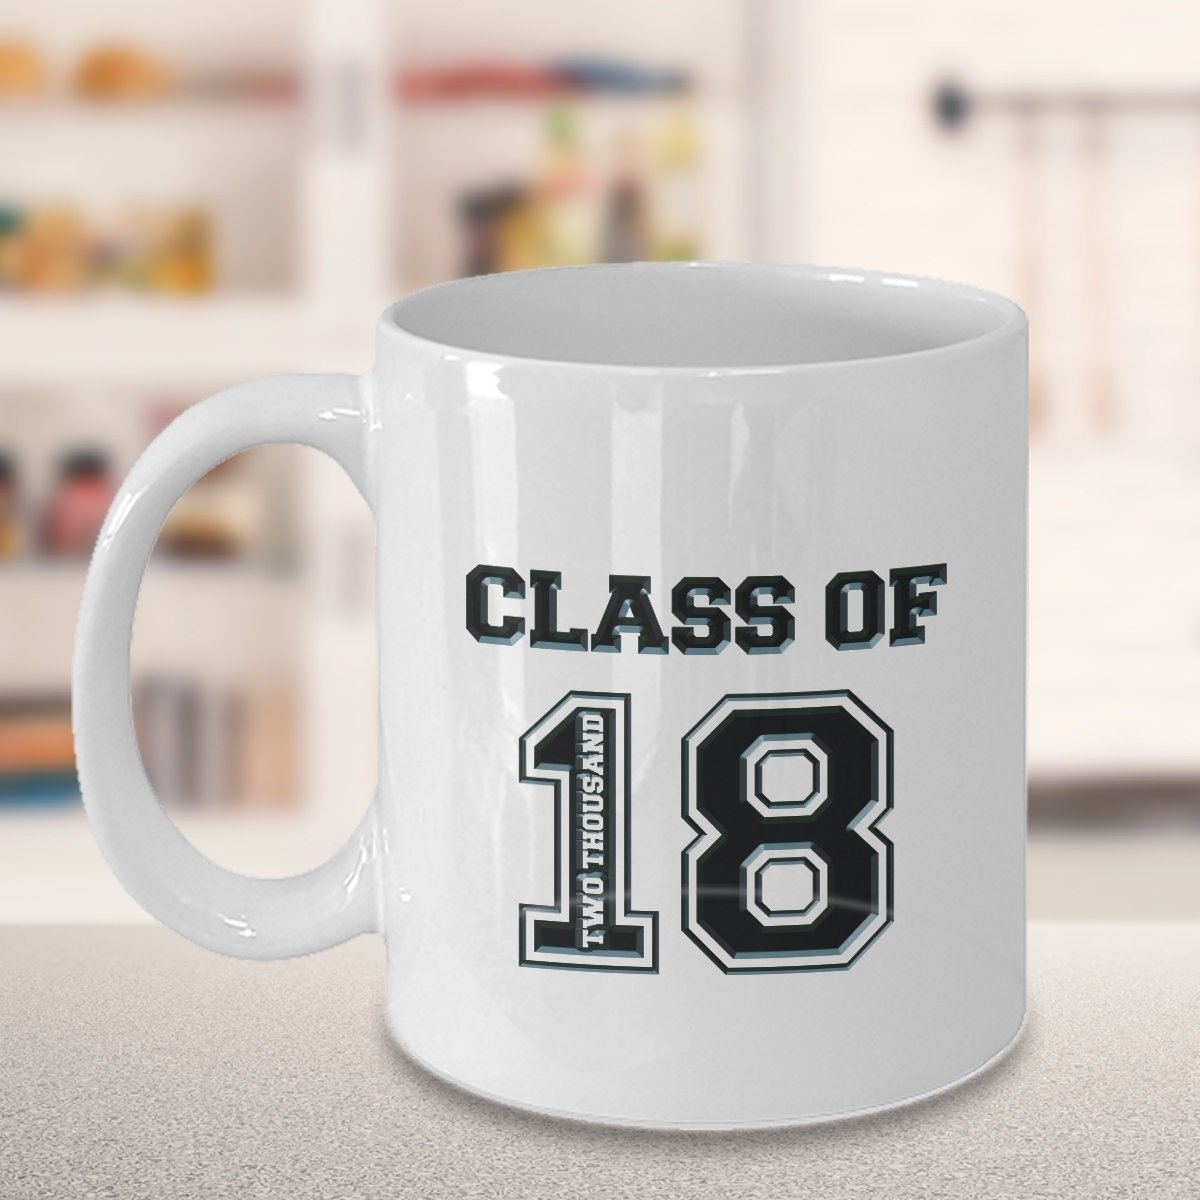 10 Wonderful Graduation Gift Ideas For Son graduation gift class of 2018 graduation gift ideas for daughter 2021